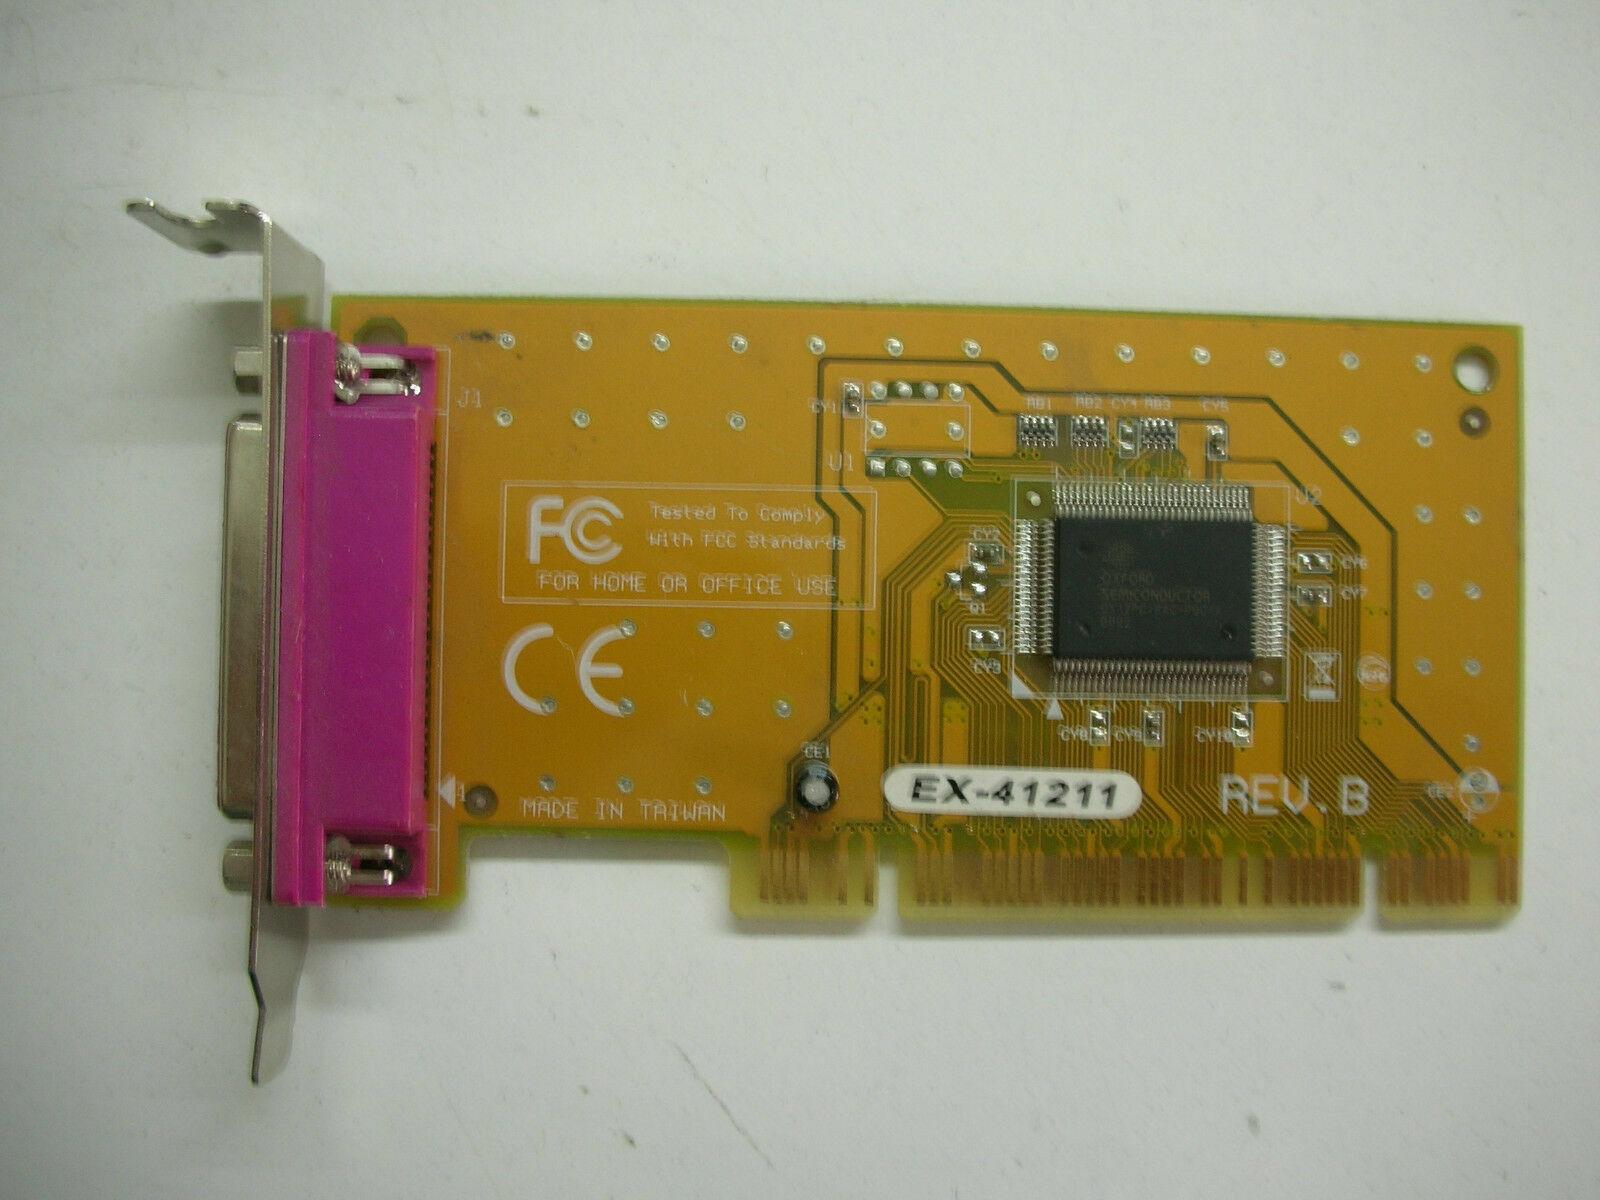 EXSYS EX-41211-S REV.B Low Profile IEEE 1284 PCI GRA 40